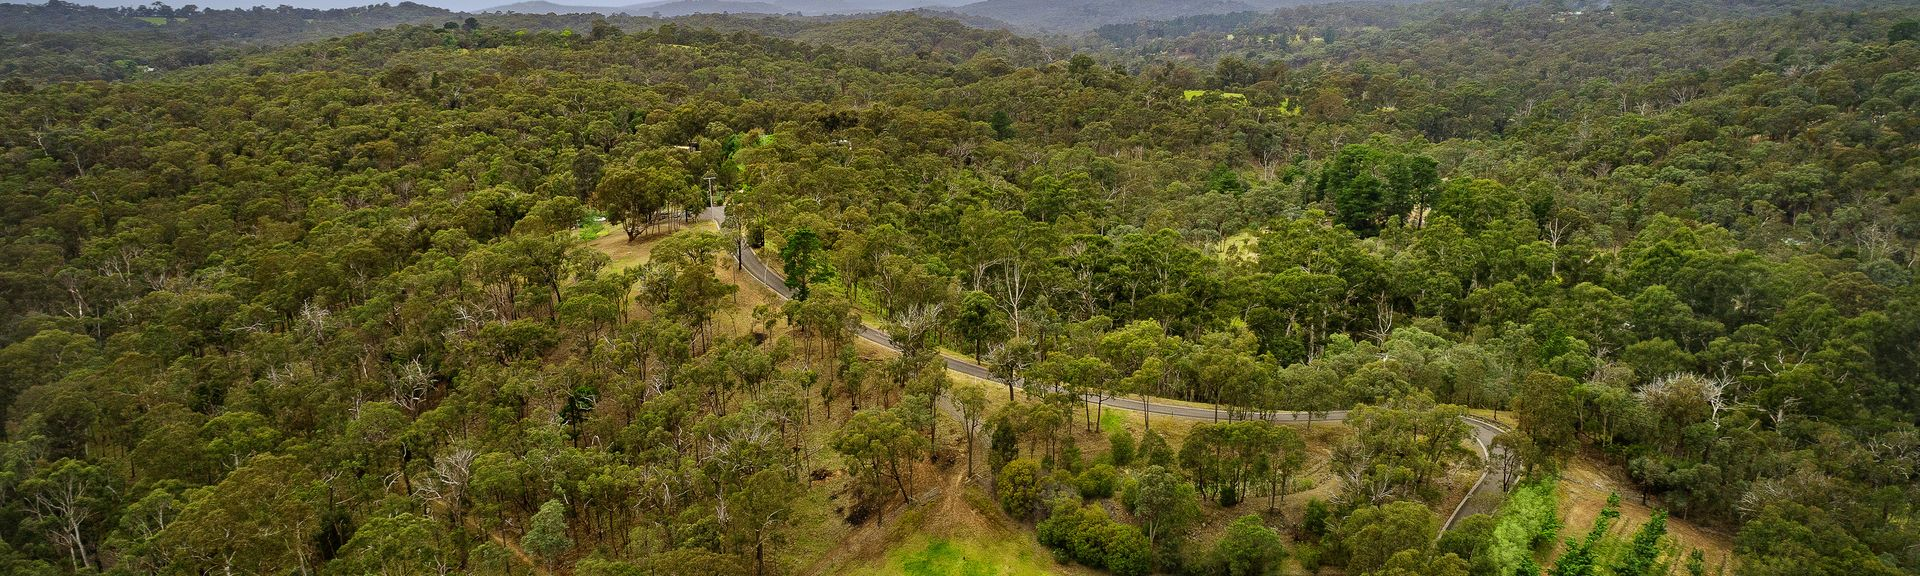 Mount Disappointment, Whittlesea, Victoria, Australien